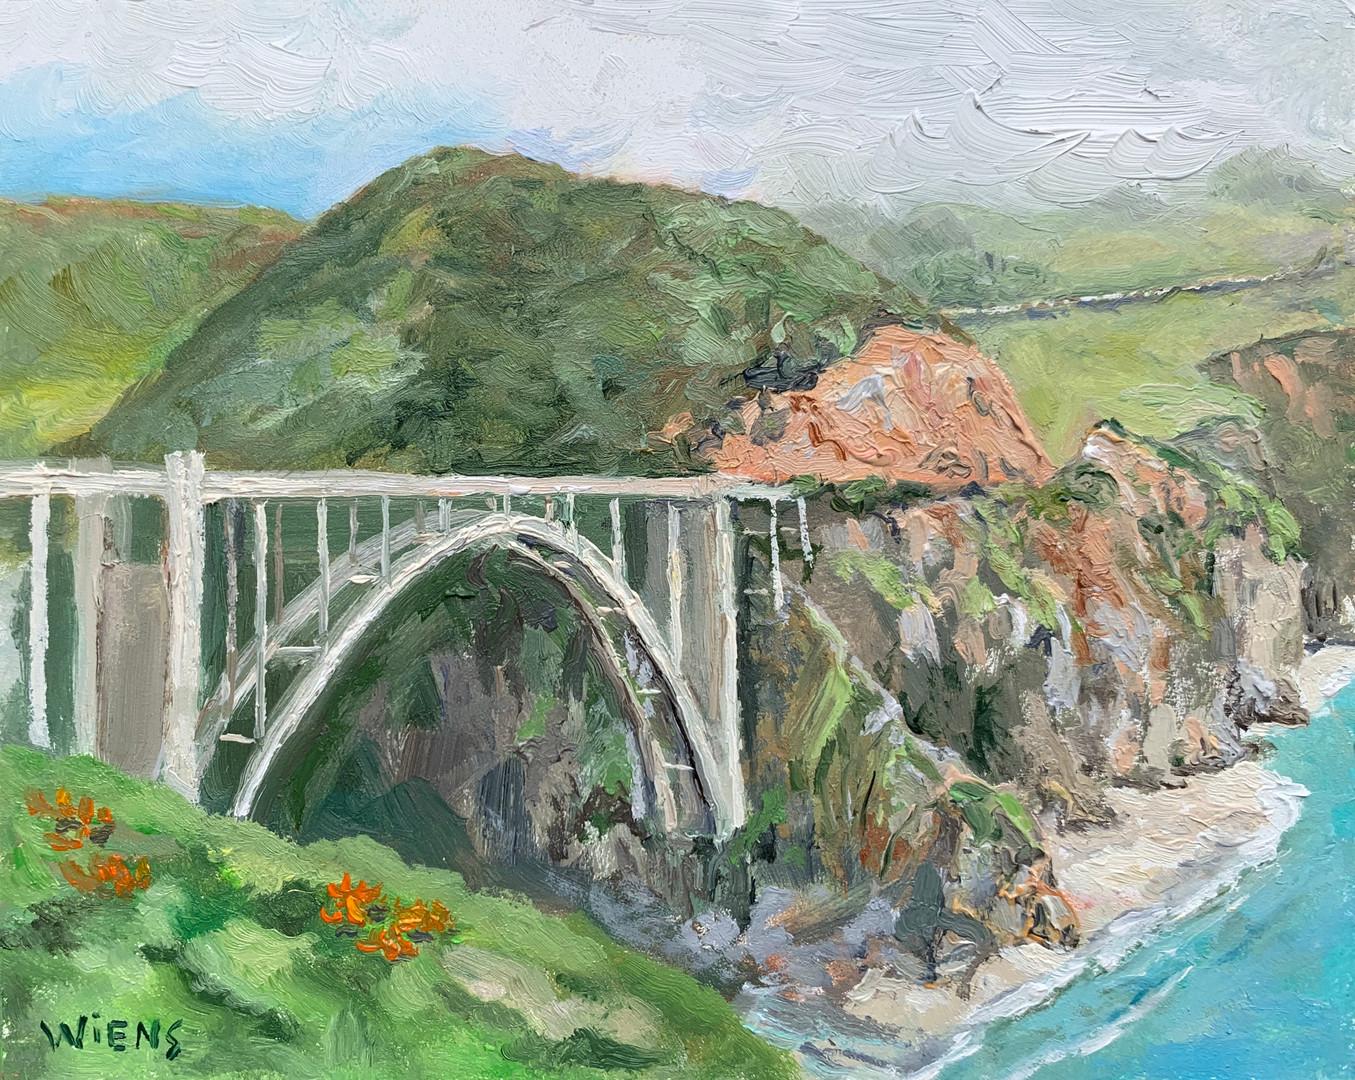 Bixby Bridge 4x5in #449.jpg